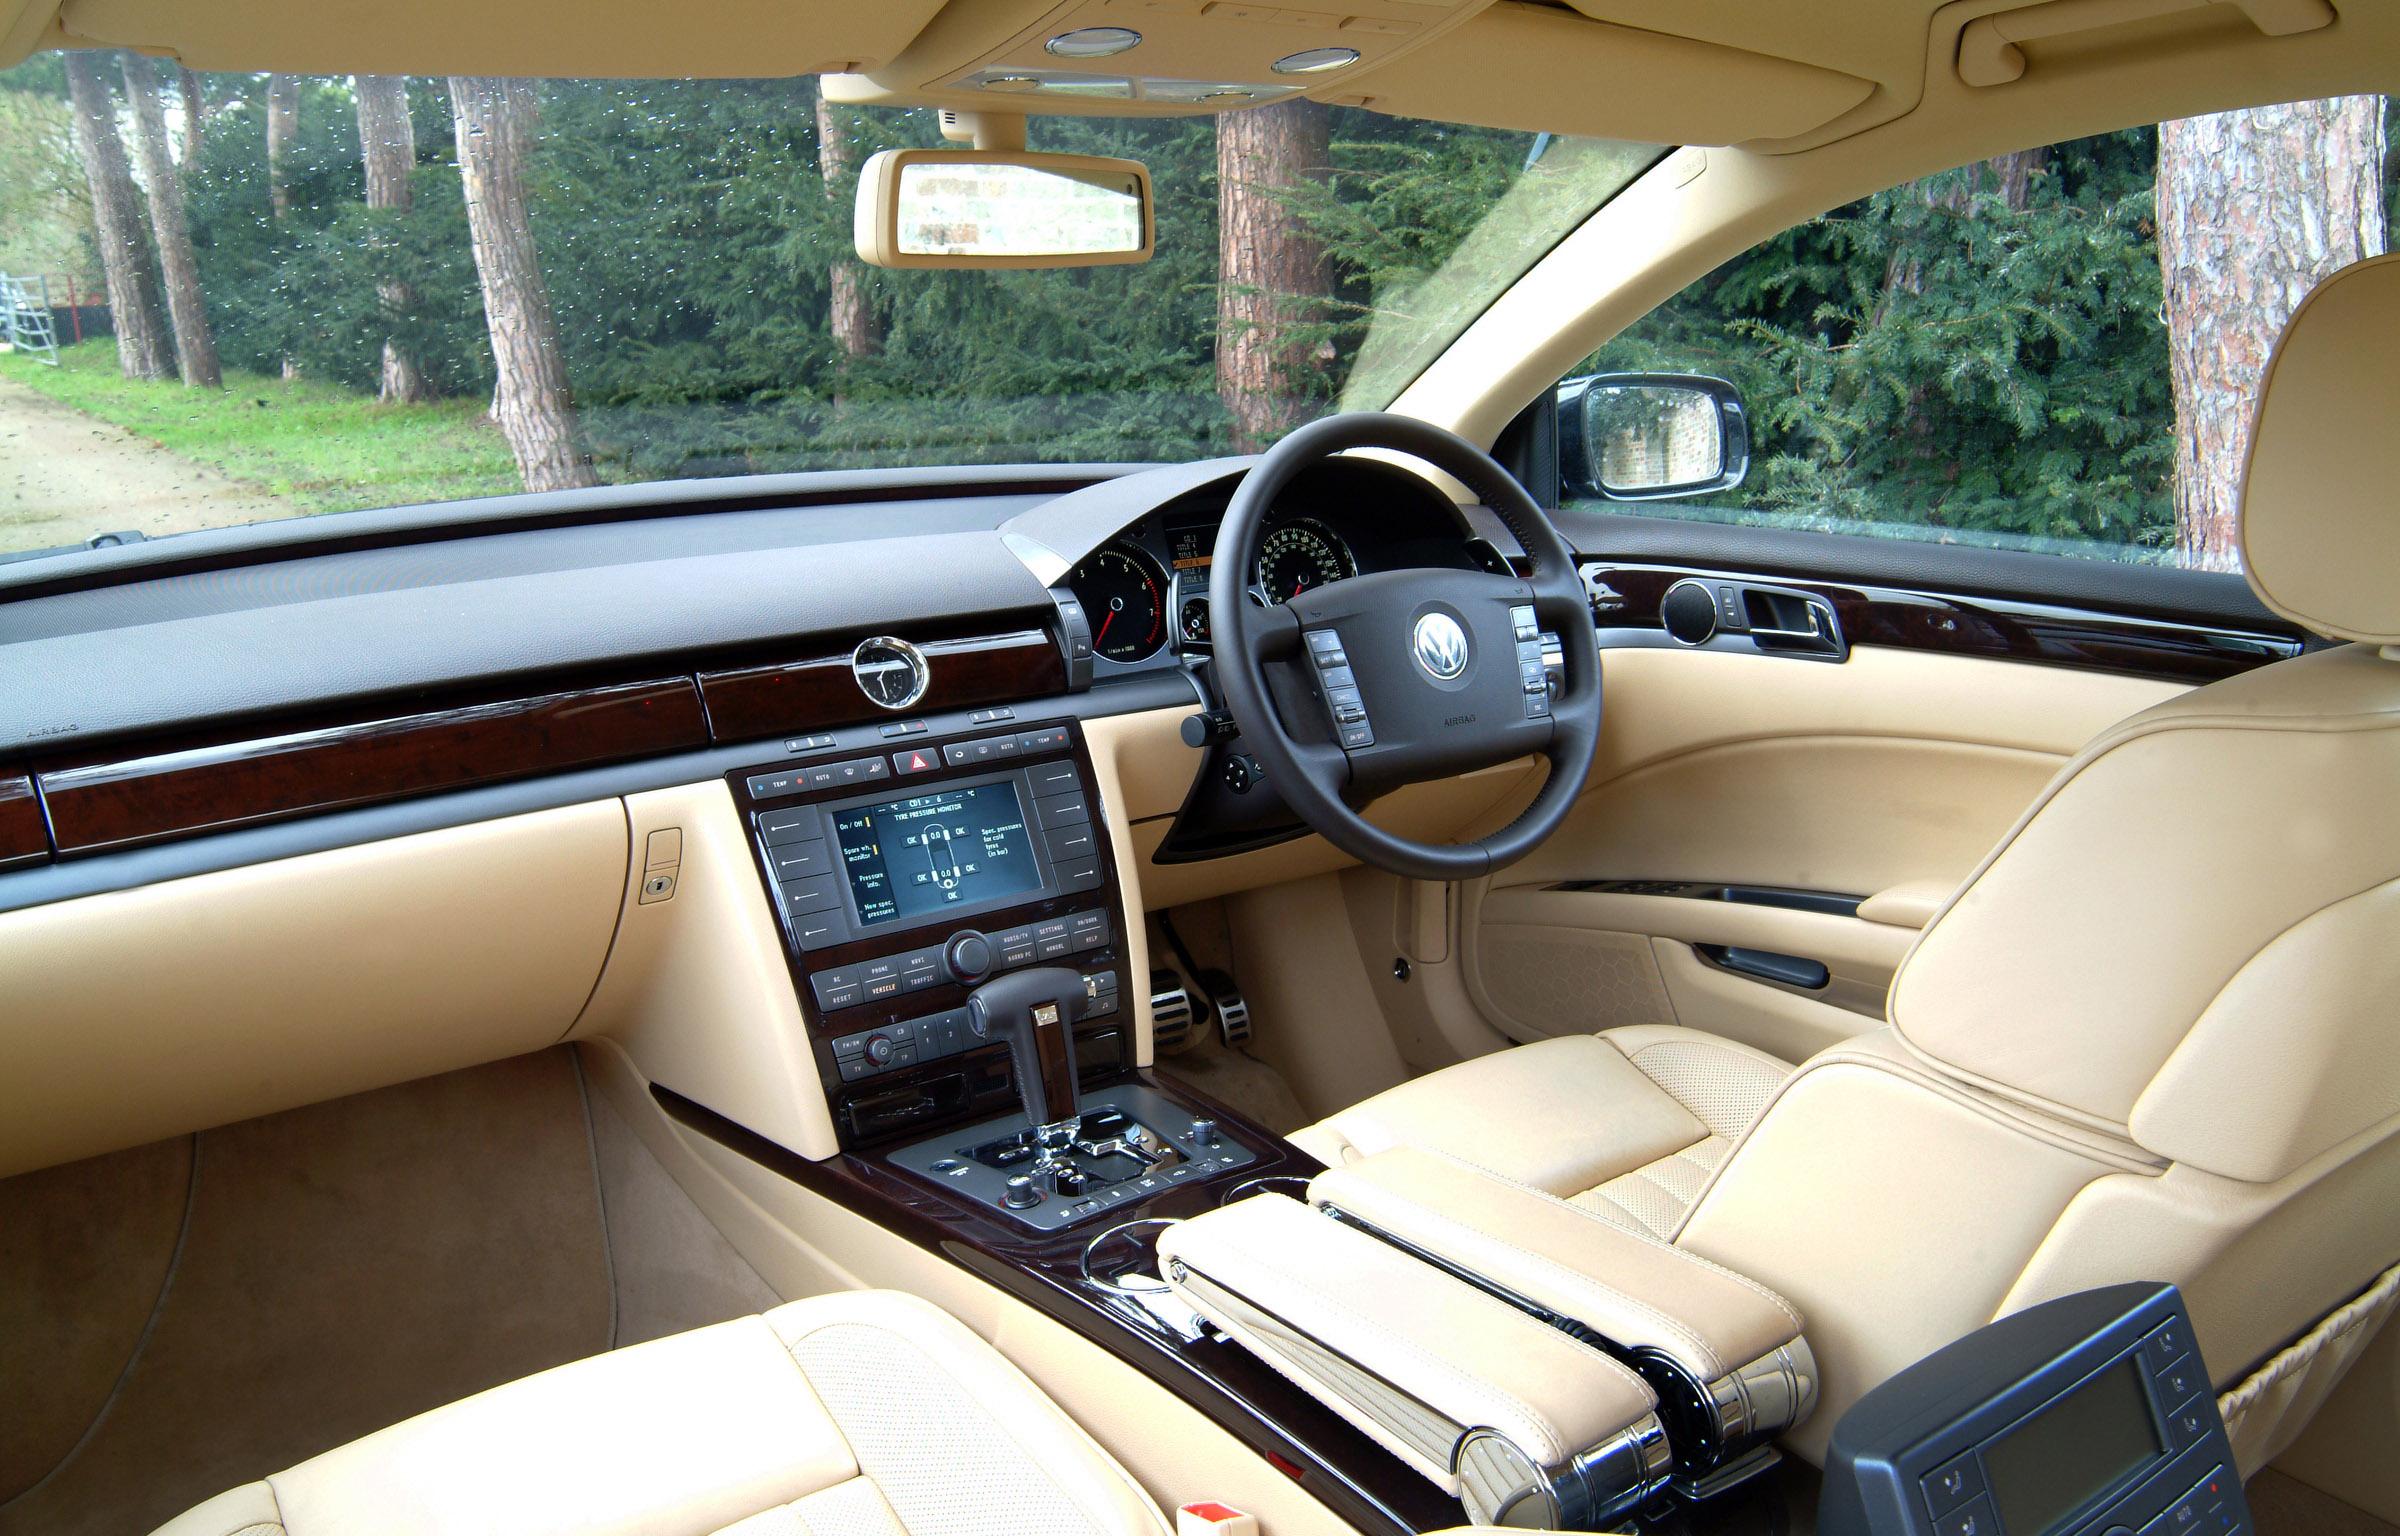 2005 Volkswagen Phaeton - Picture 71826